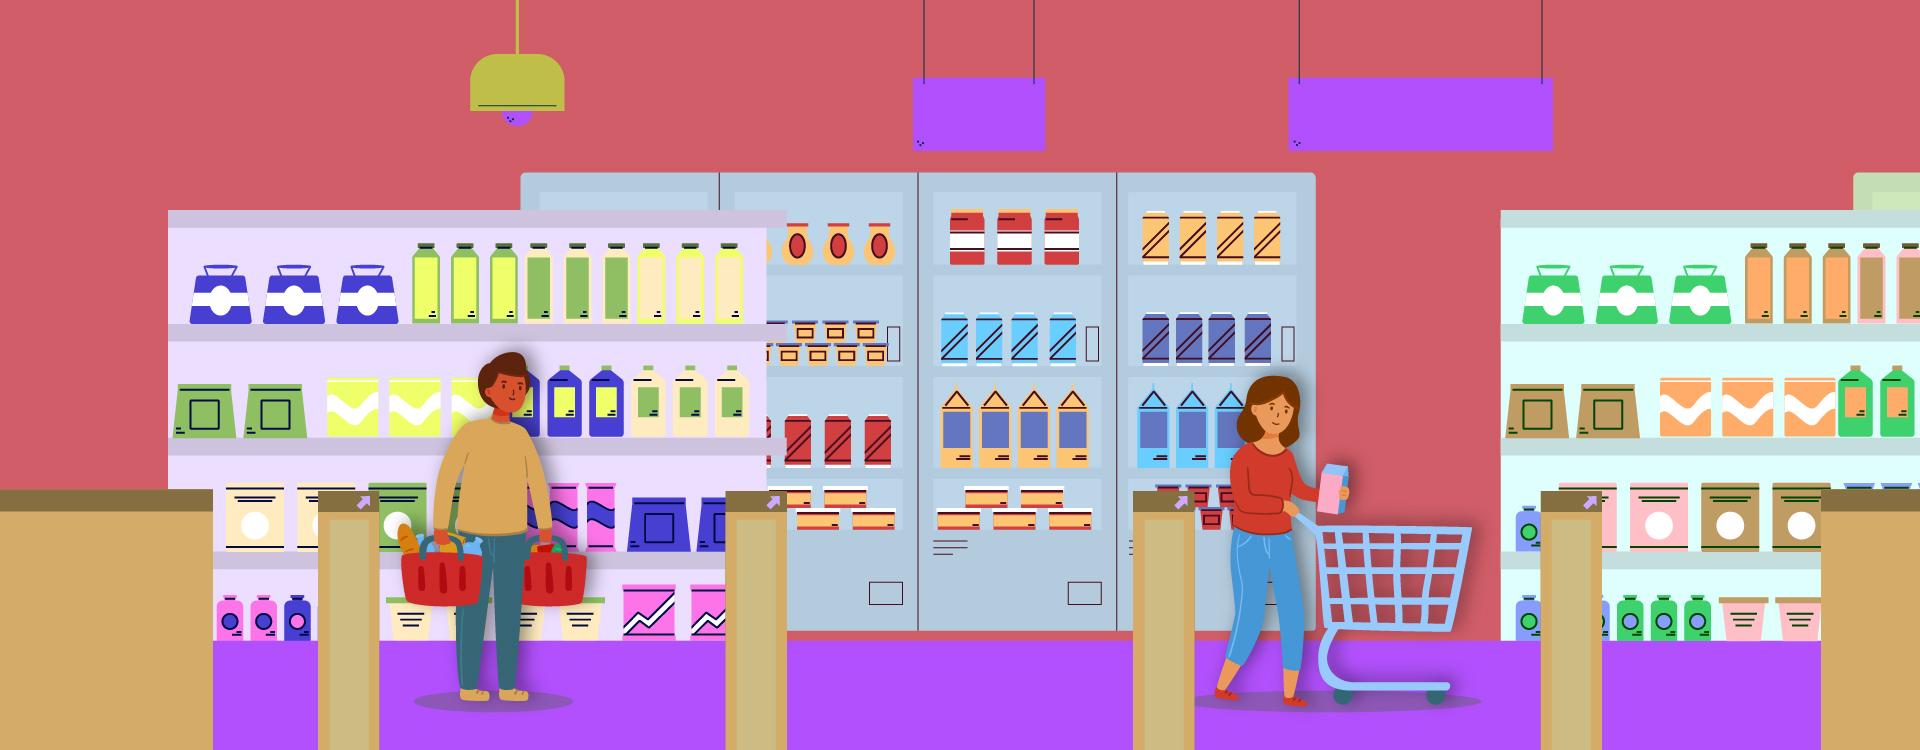 Cashierless Supermarkets - Future of Retail - Amazon Go